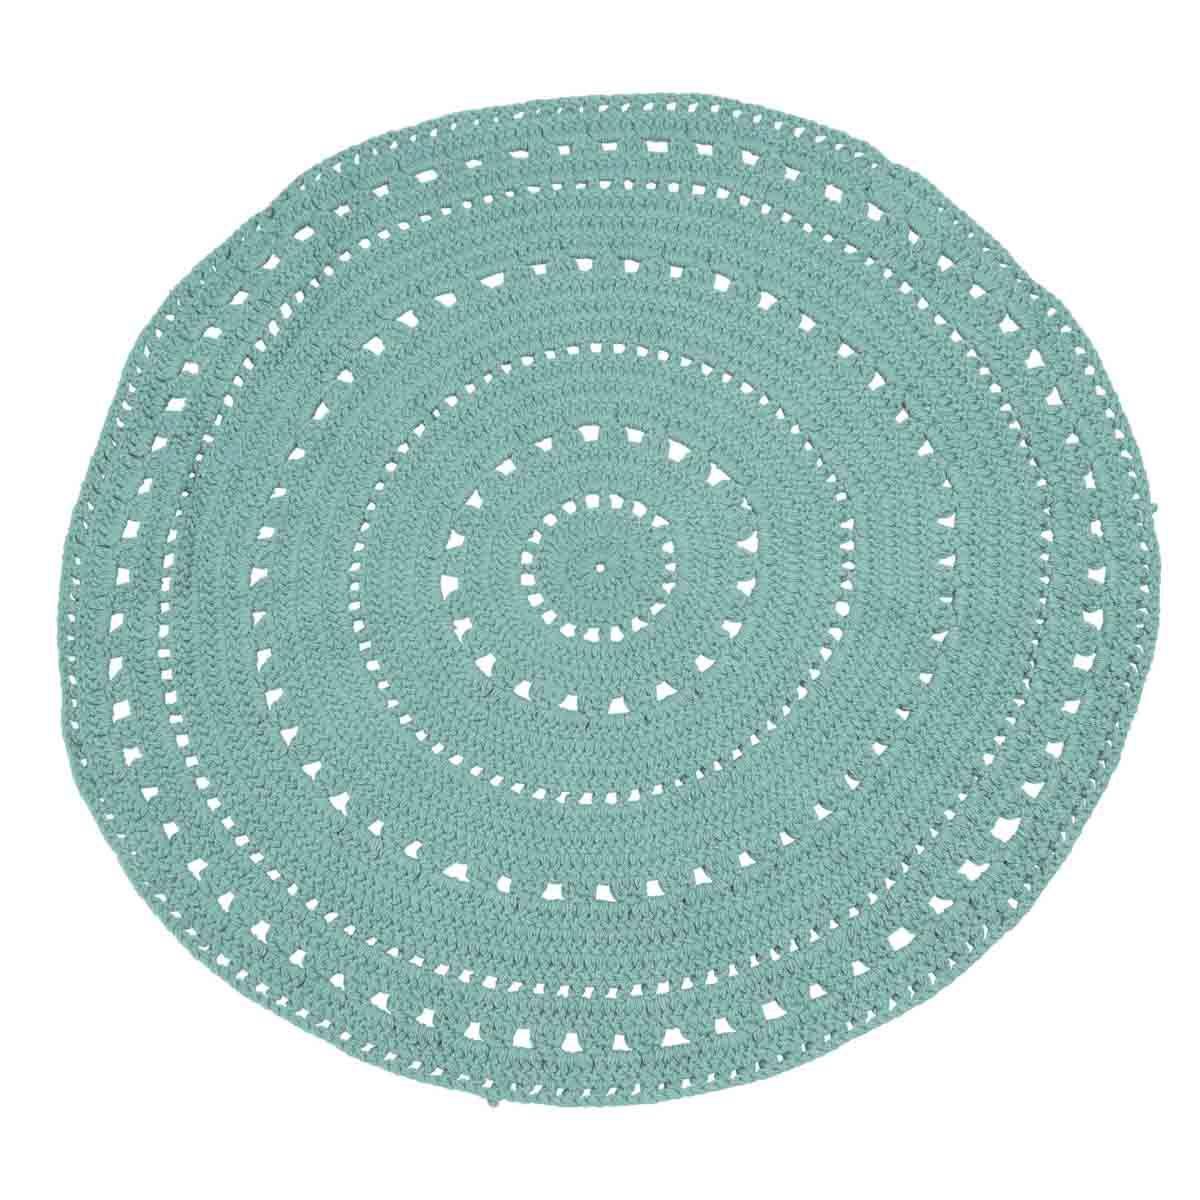 tapis style boheme gipsy coton bleu clair 120 cm umaa zago store. Black Bedroom Furniture Sets. Home Design Ideas